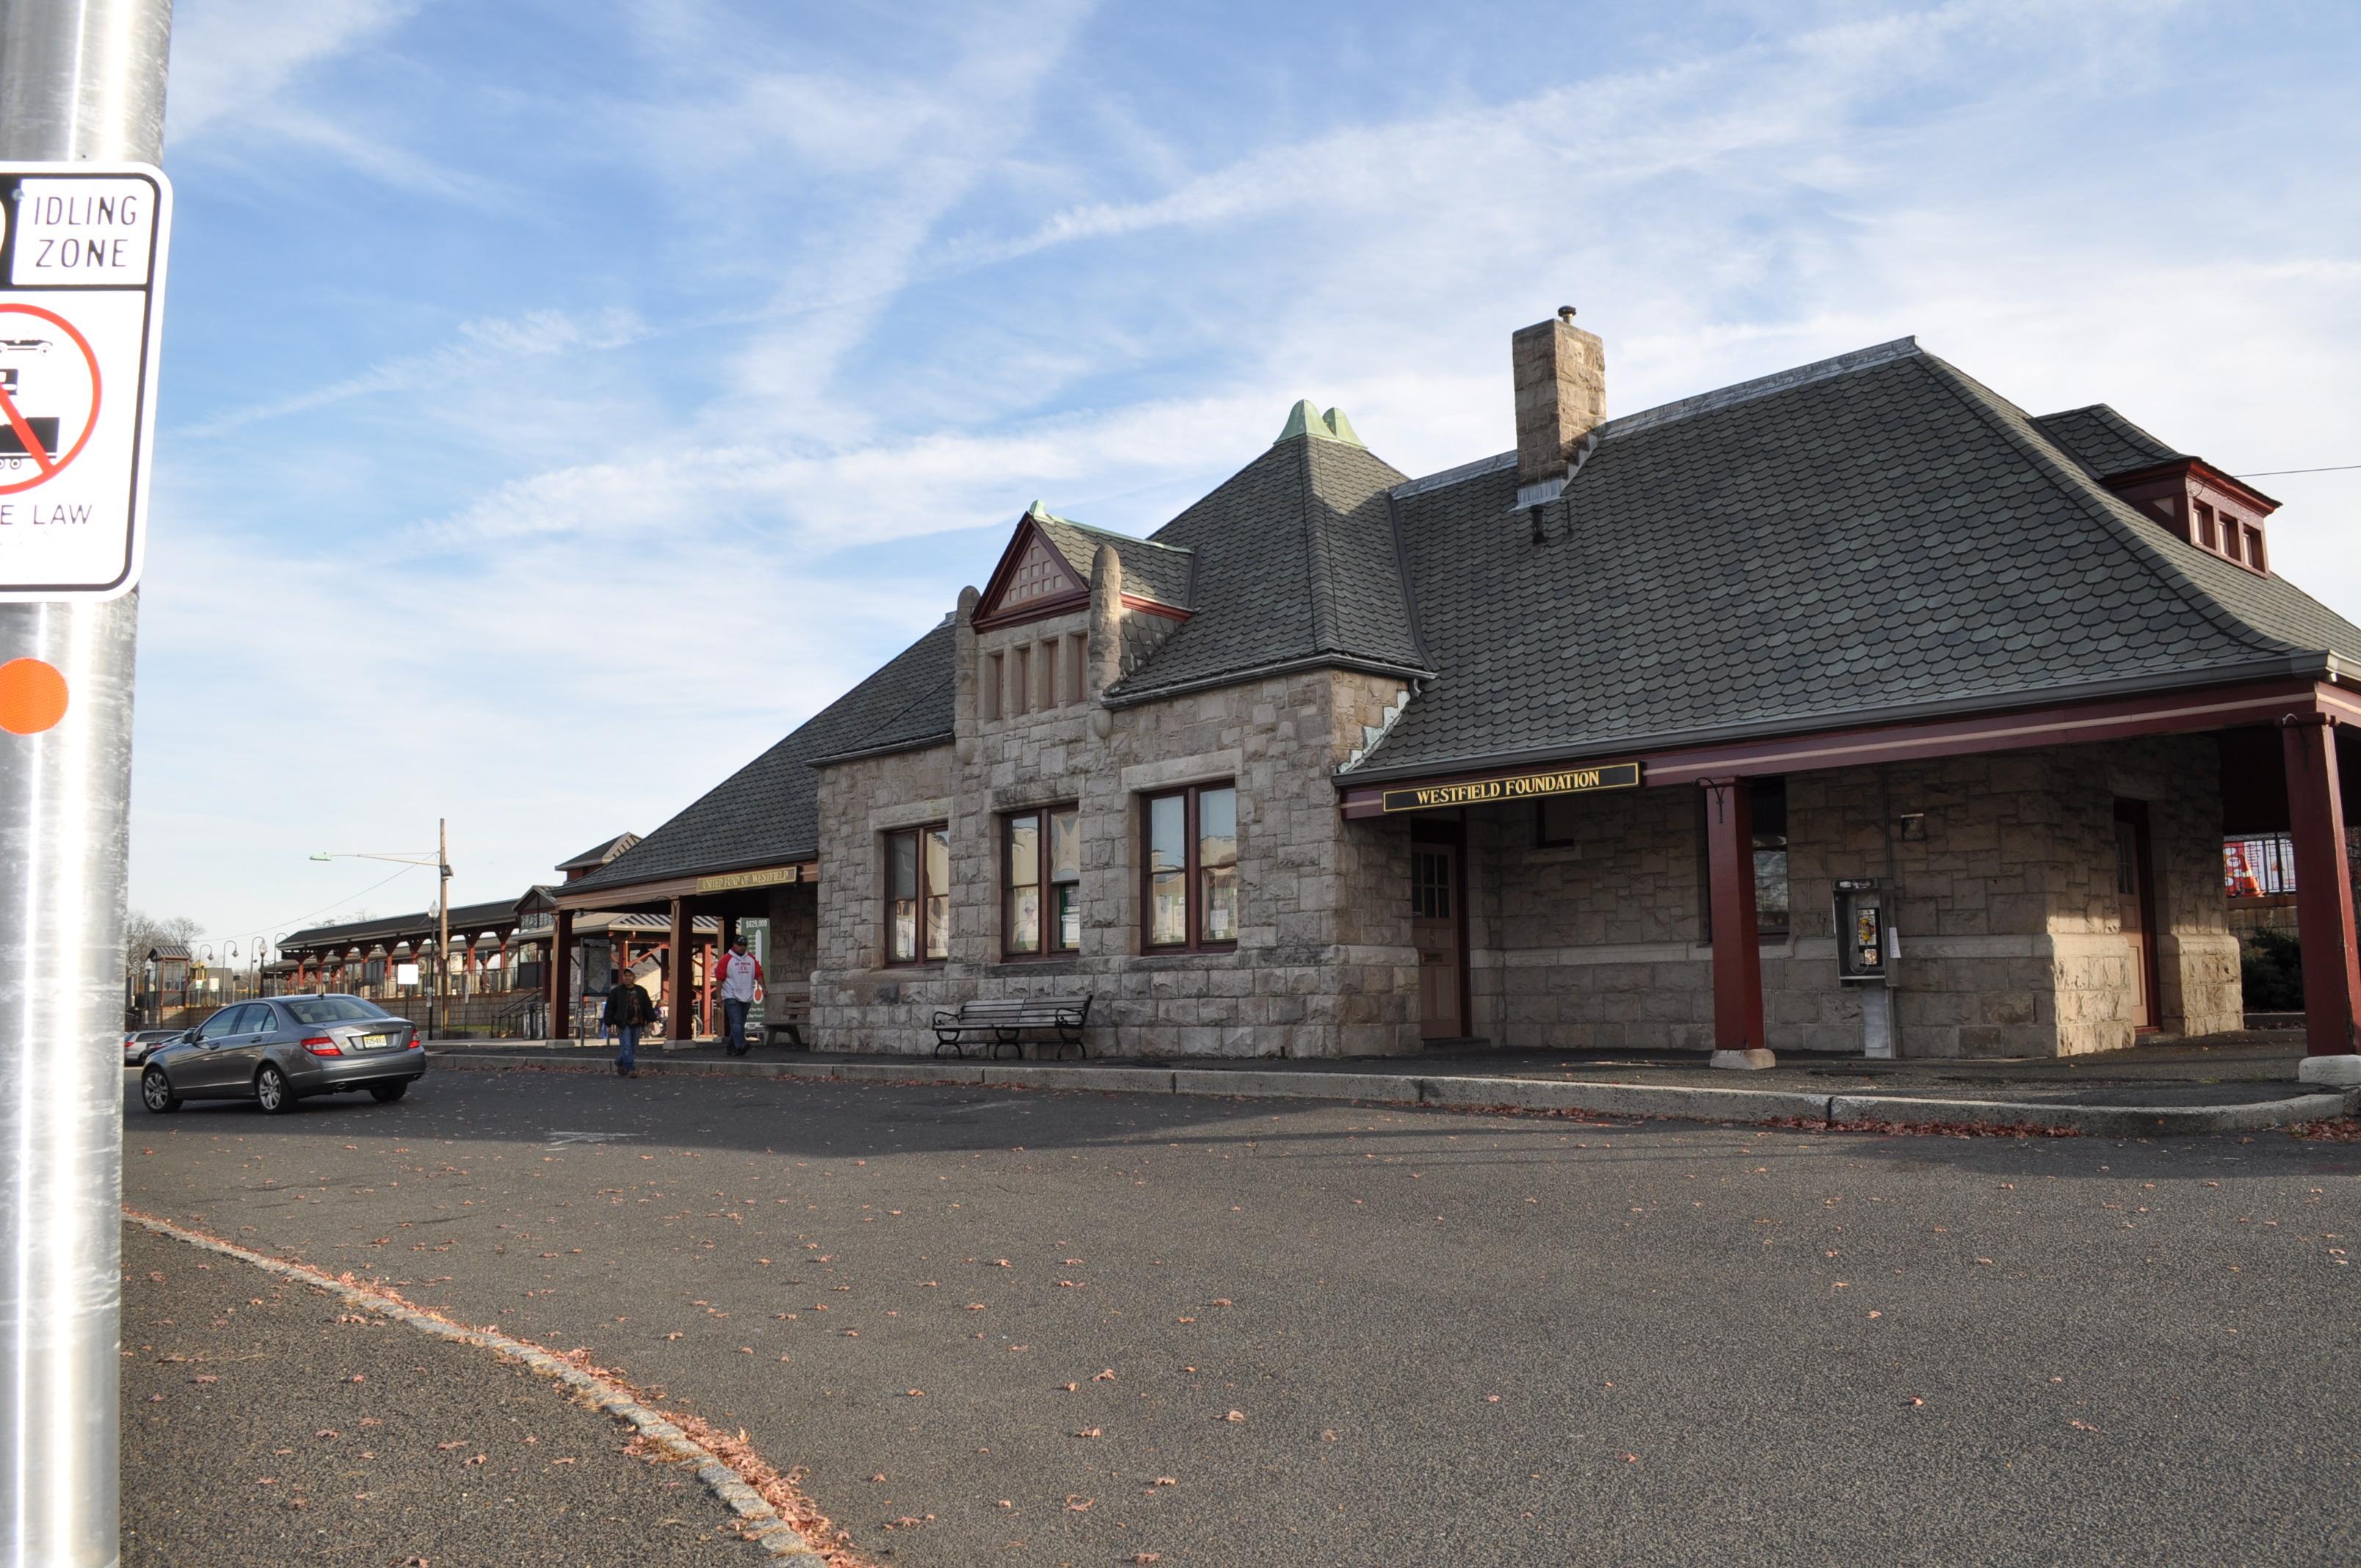 00249e5a40a70f58c7fd_train_station.JPG